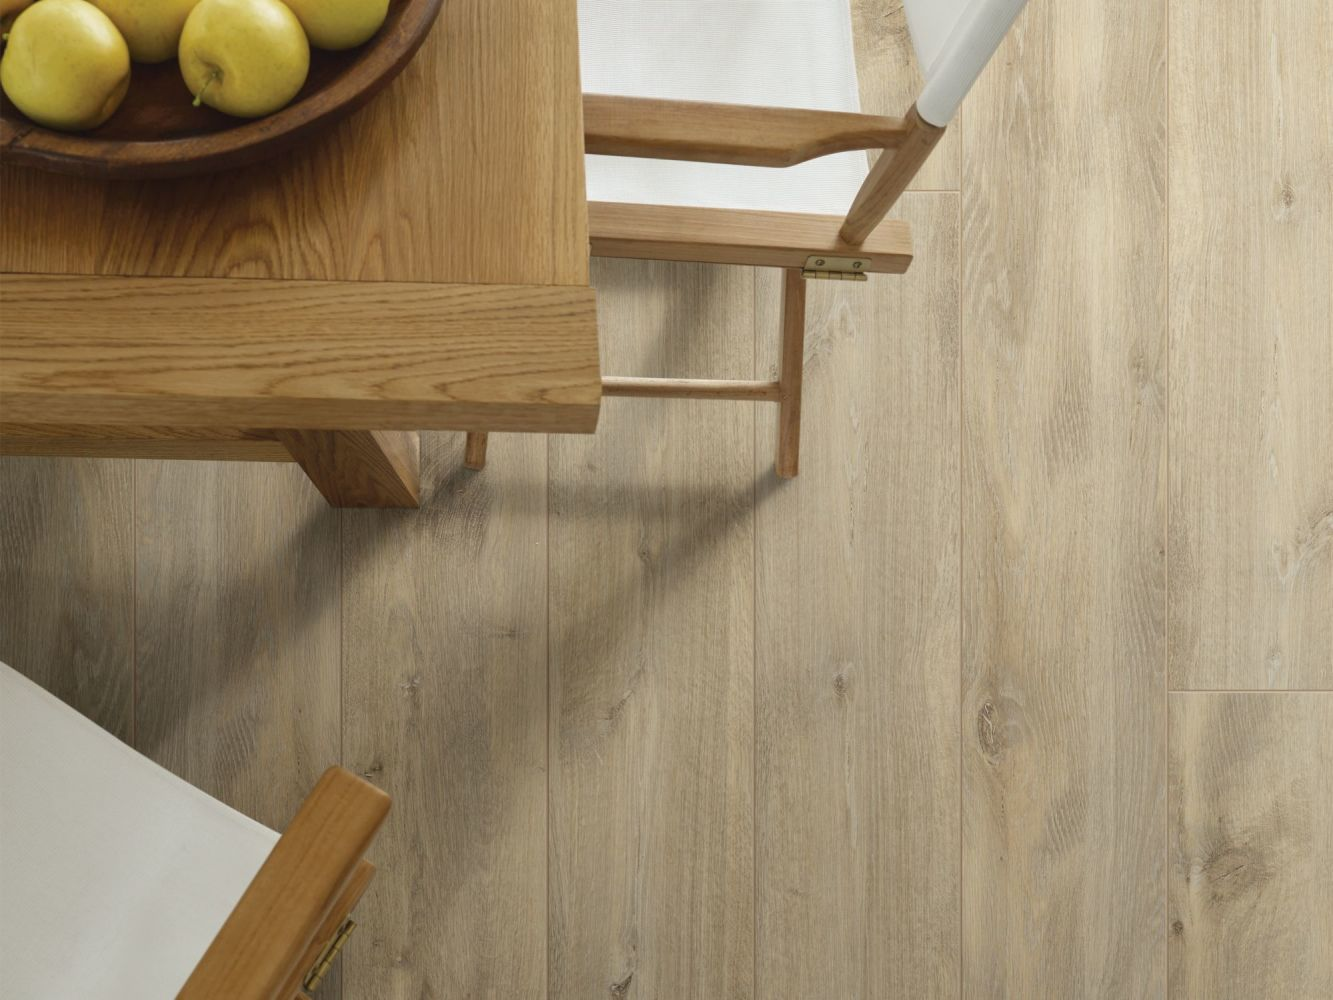 Shaw Floors Resilient Residential Allegiance+ Accent Ryman Oak 07068_2008V